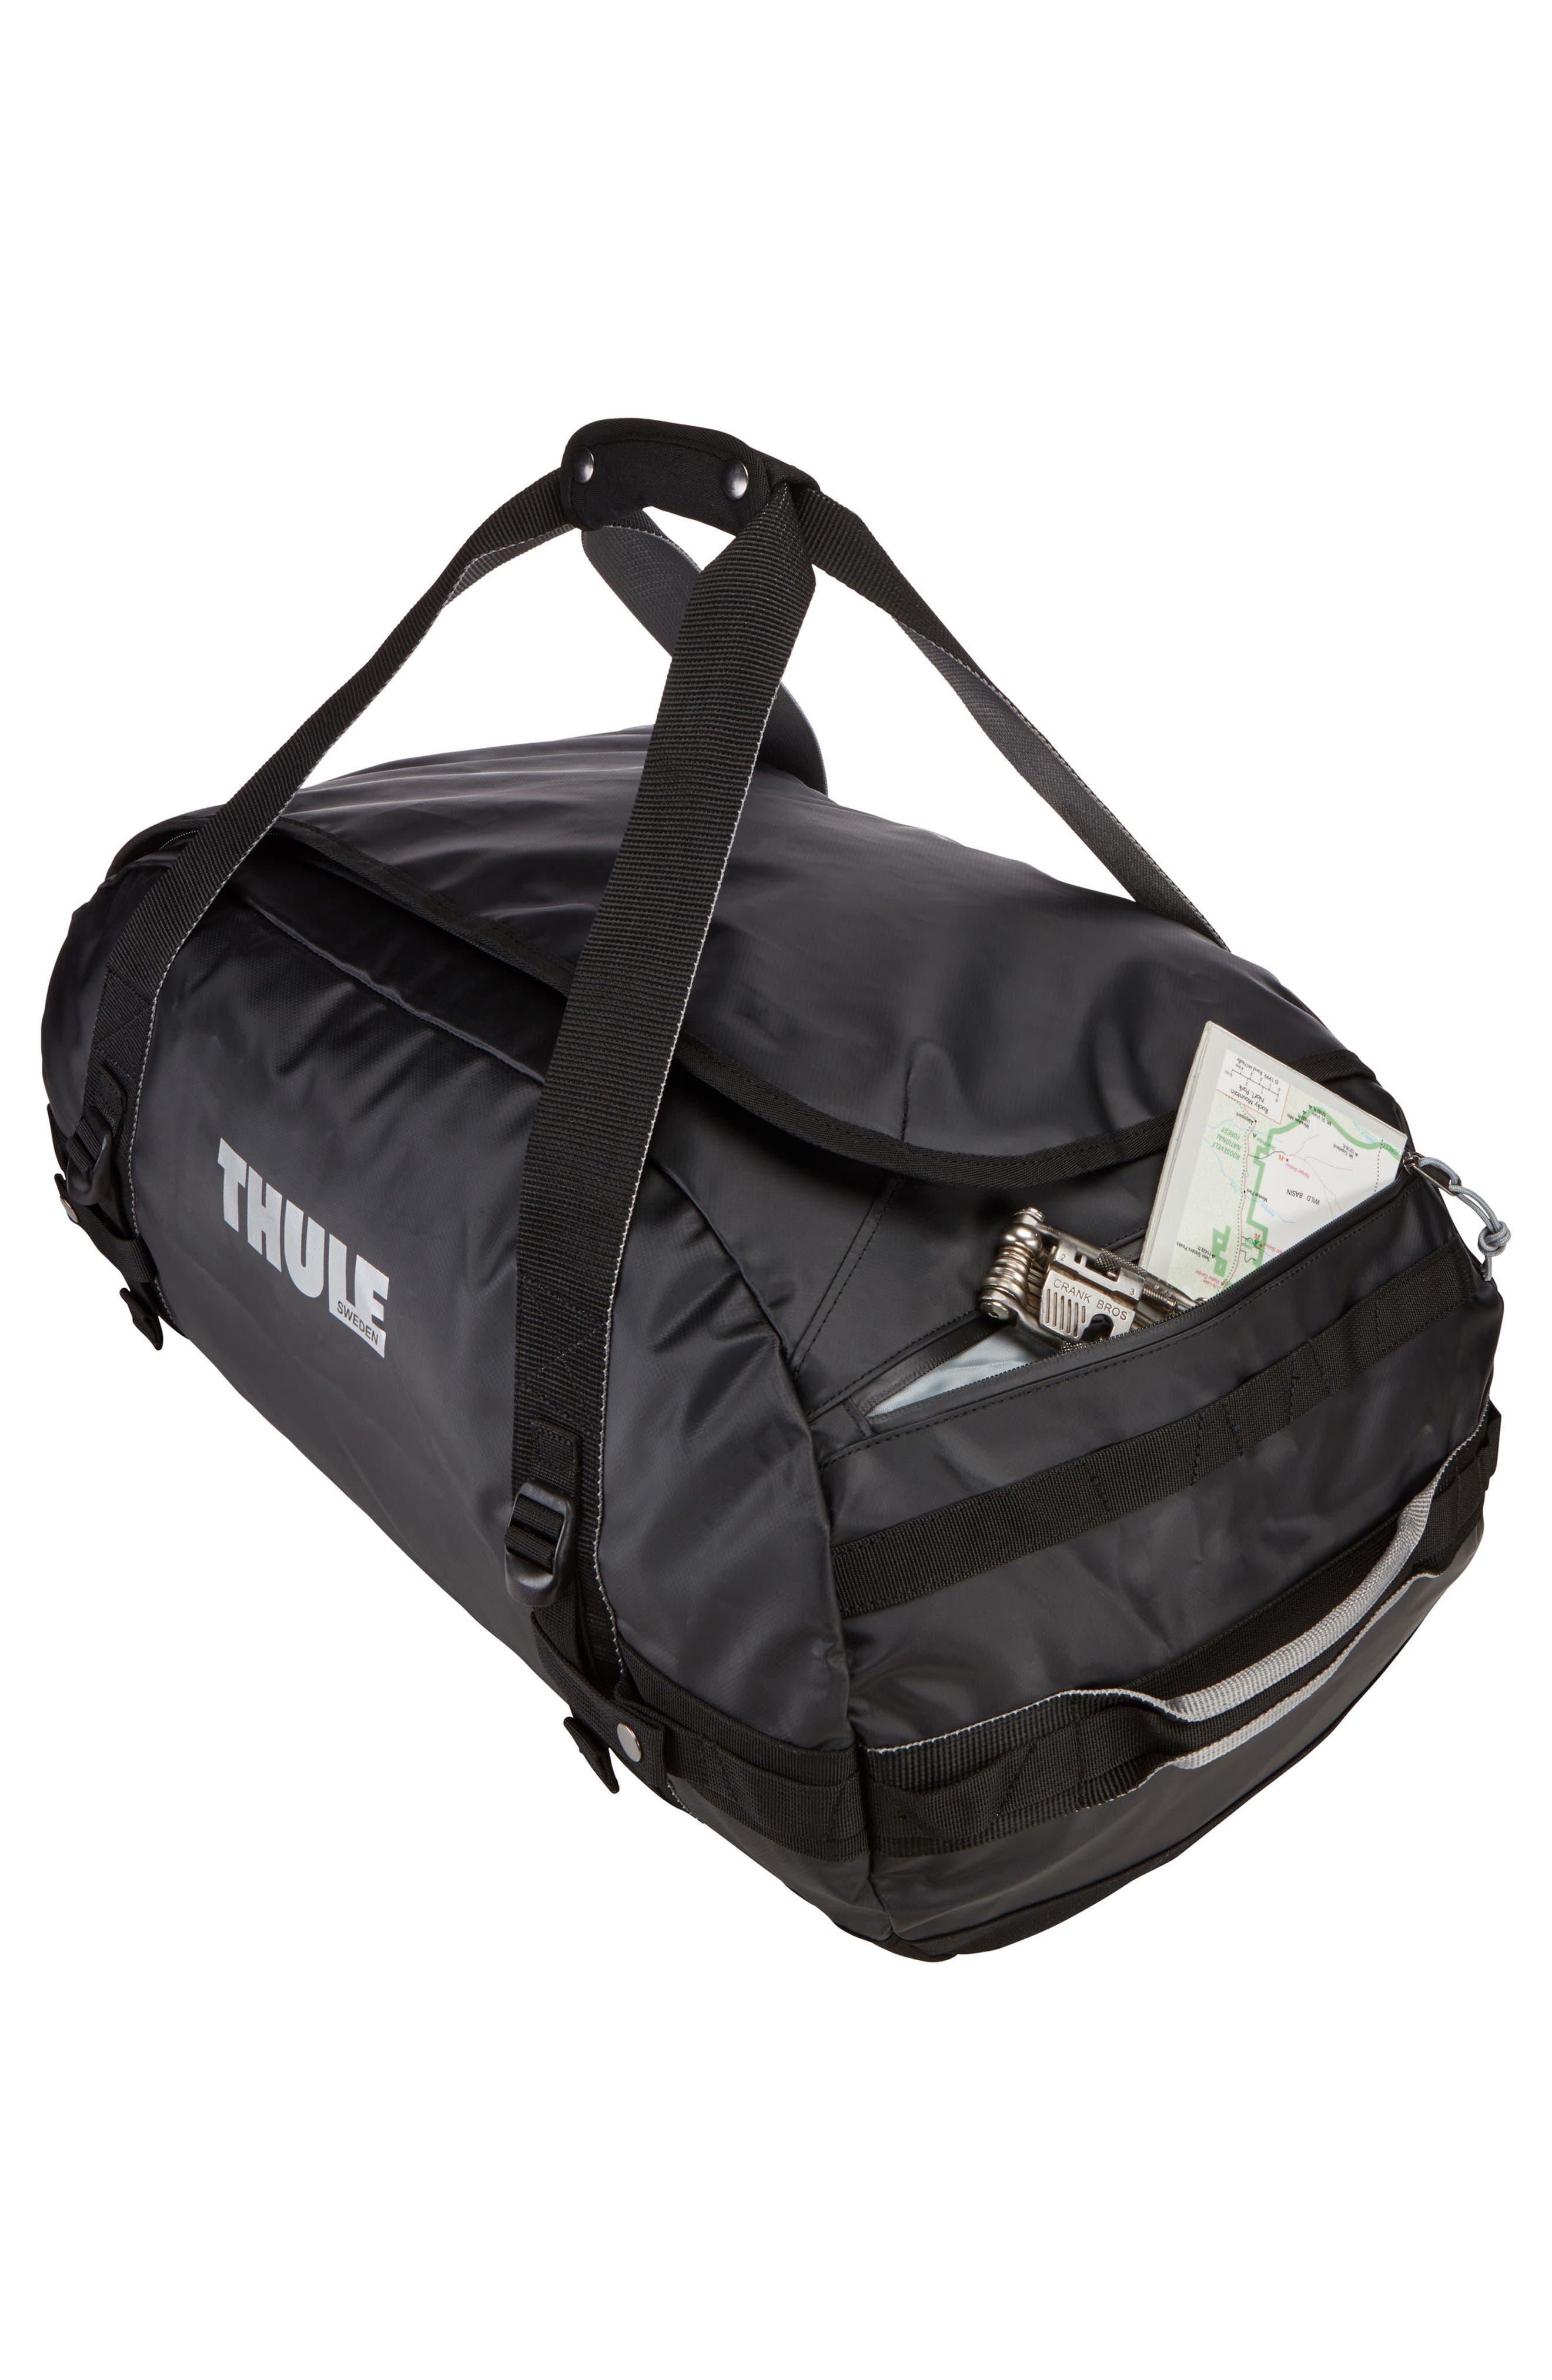 Chasm 130-Liter Convertible Duffel Bag,                             Alternate thumbnail 6, color,                             BLACK